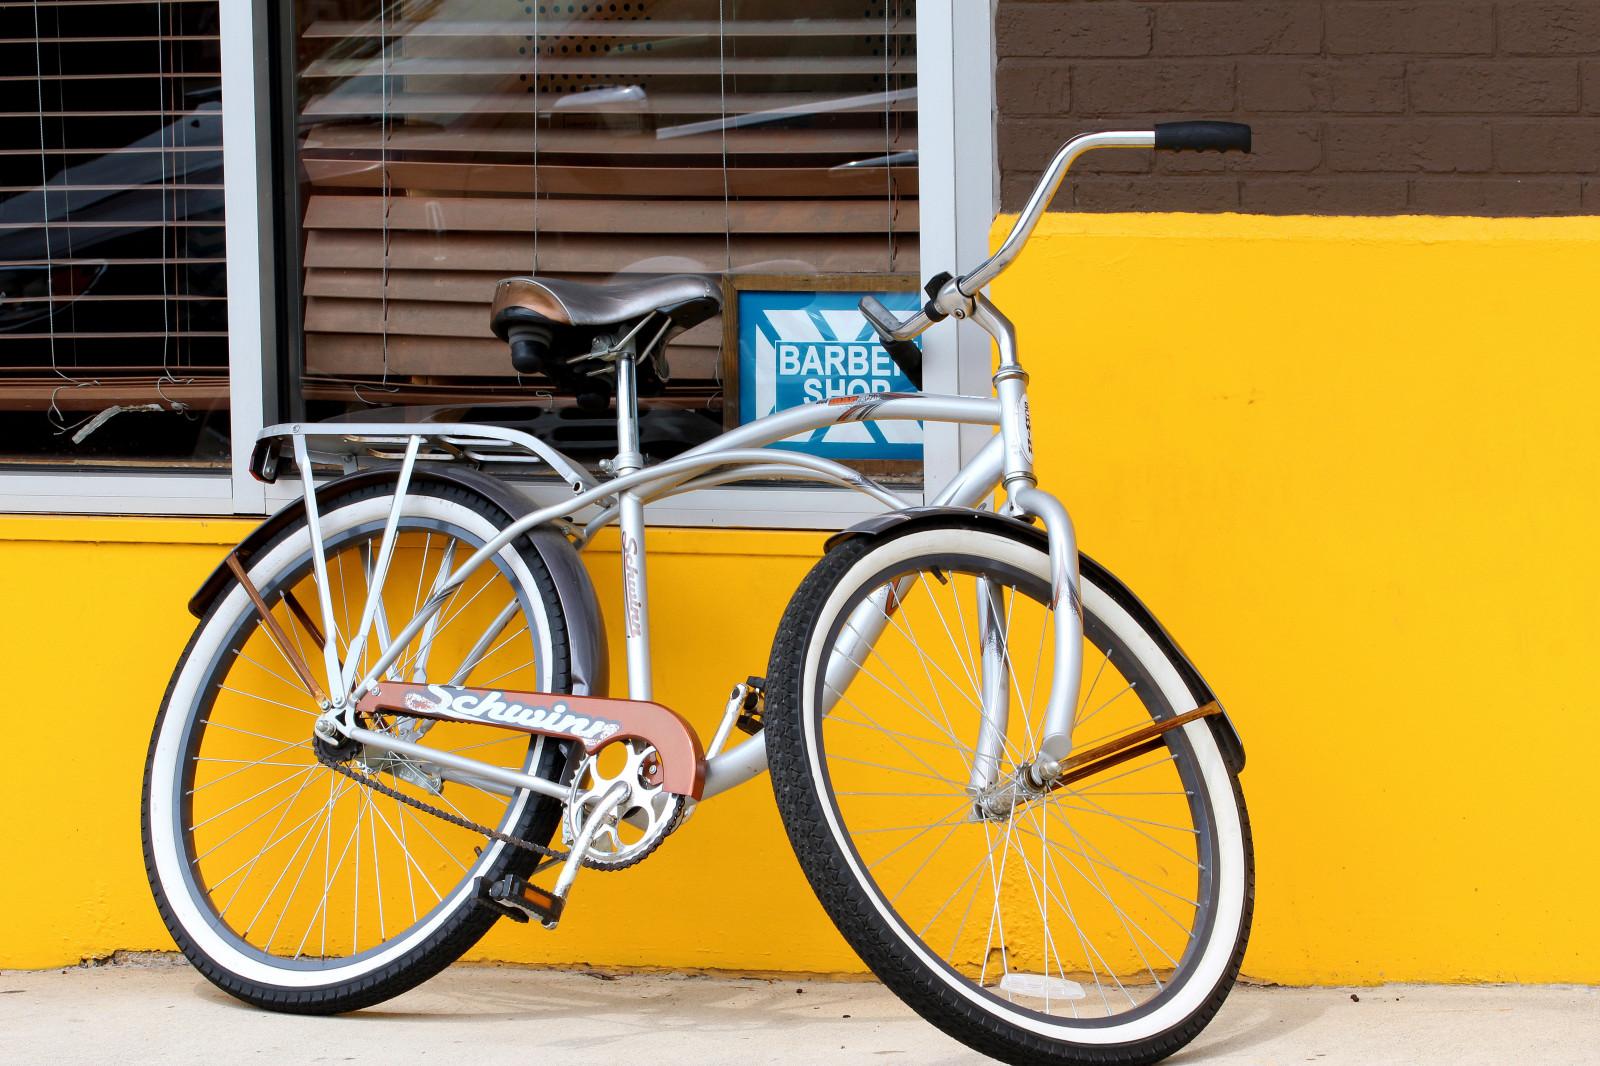 Hintergrundbilder : Fenster, Fahrrad, rot, Fahrzeug, Mauer, Gelb ...